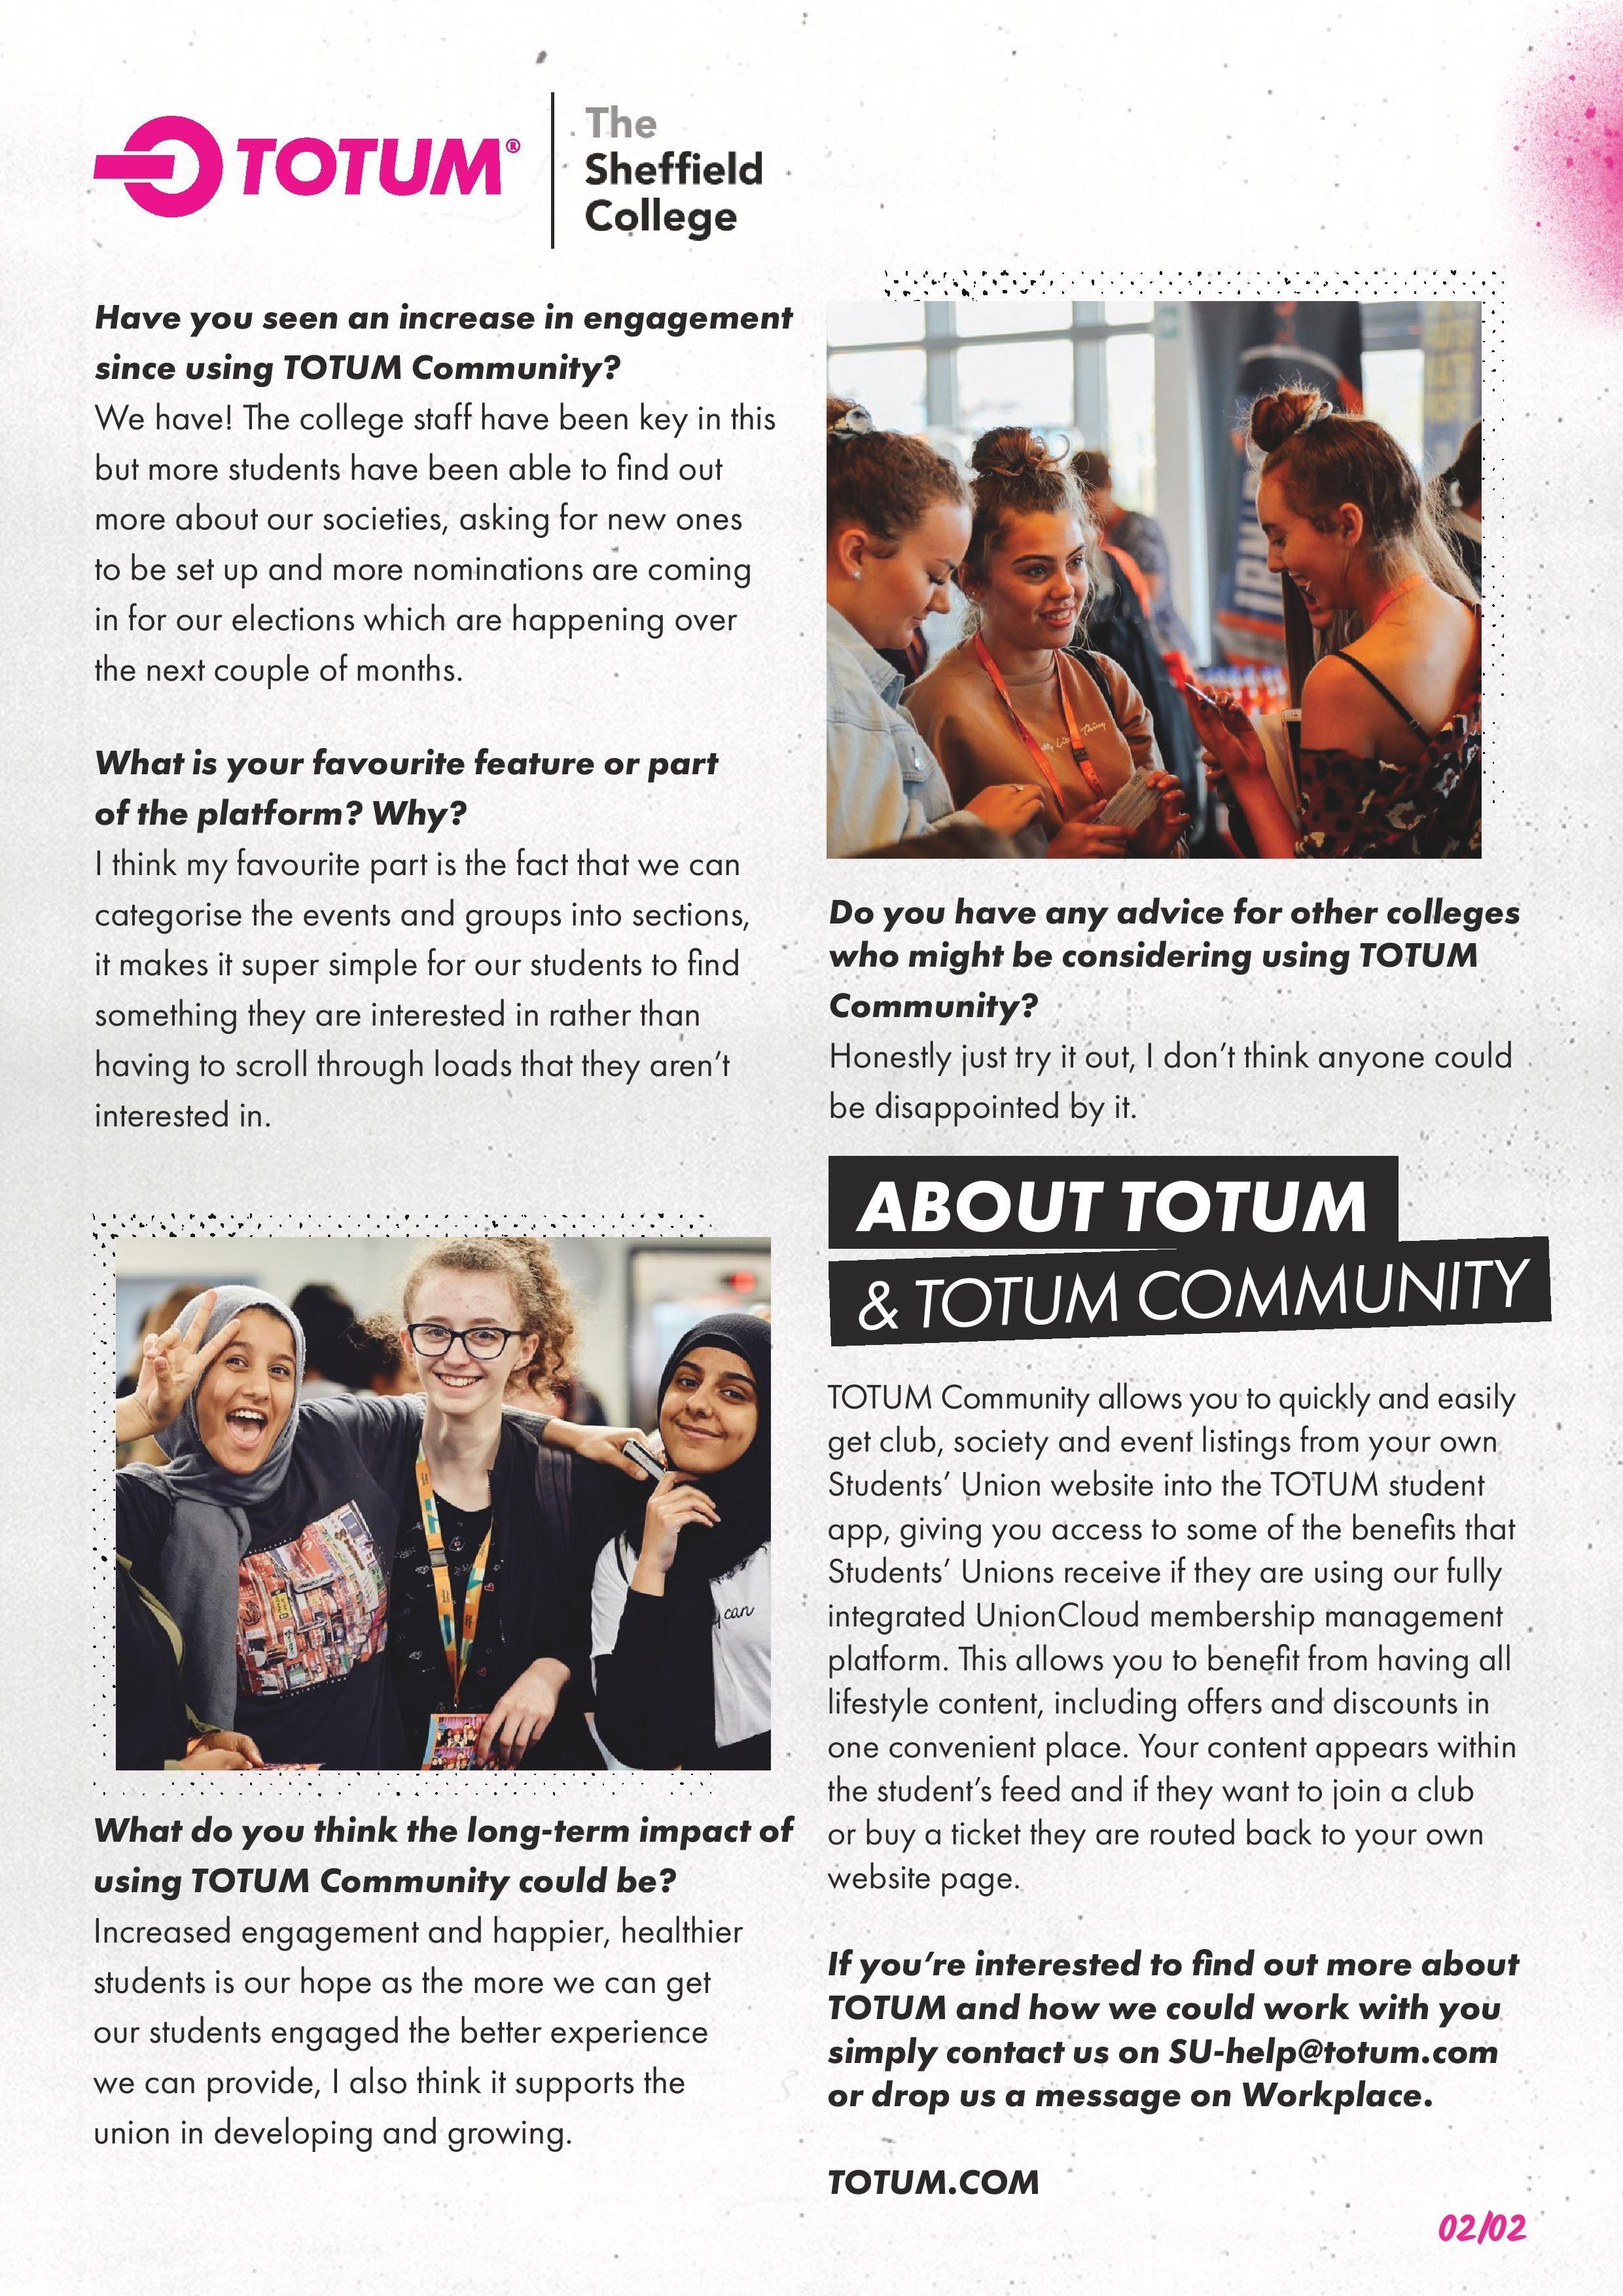 TOTUM_-_Community_Case_Study-page-002.jpg